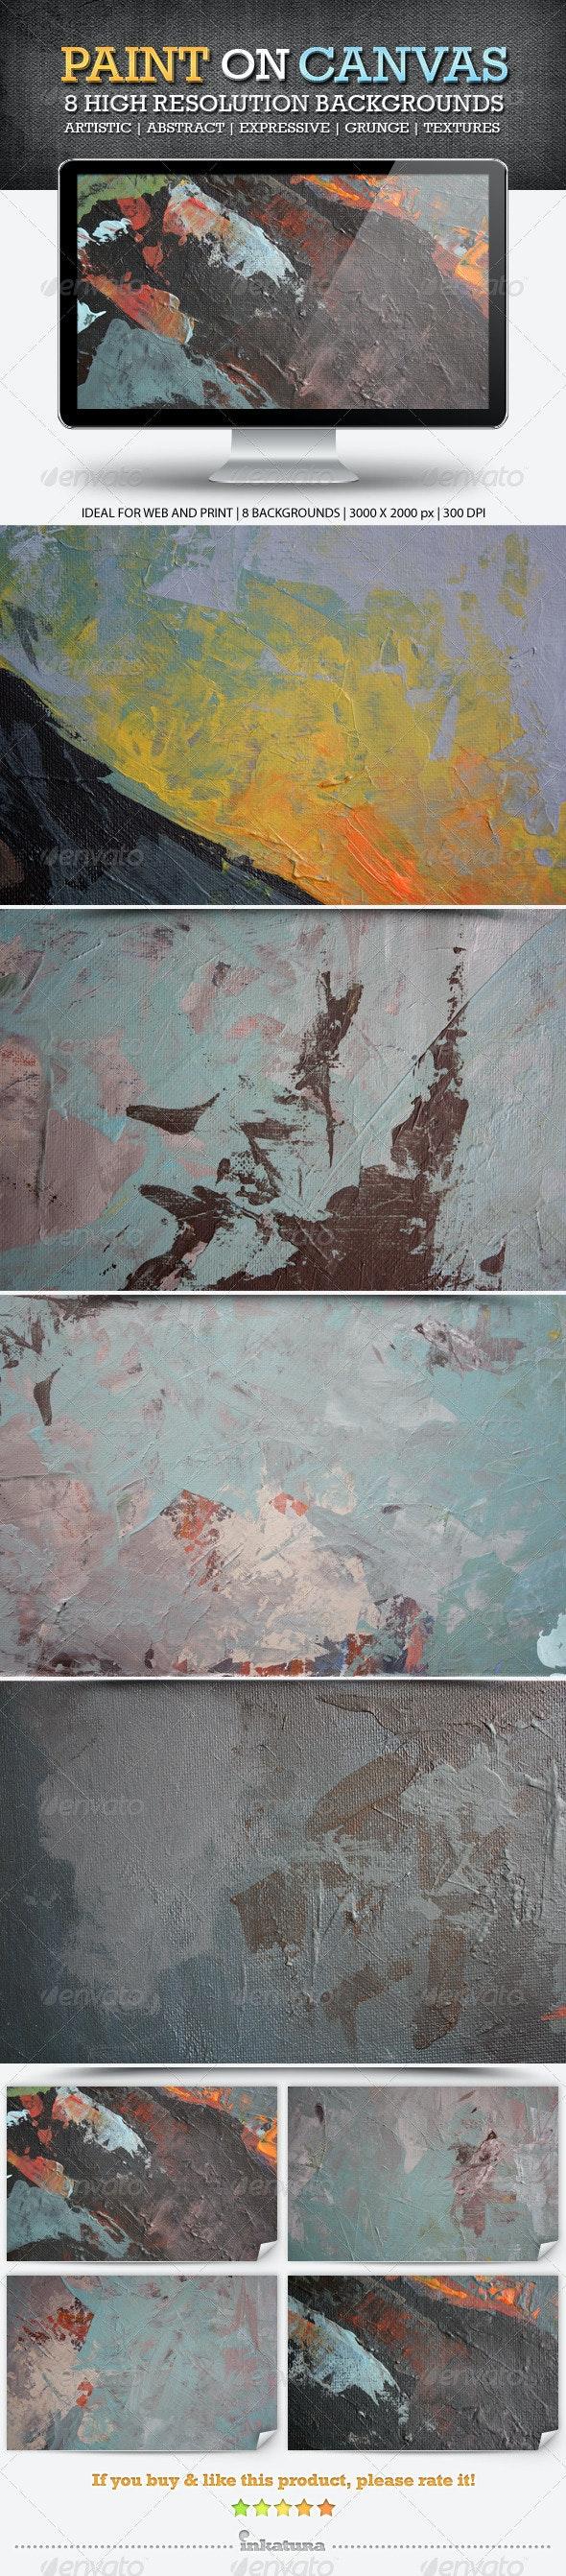 Paint on Canvas Backgrounds - Backgrounds Graphics